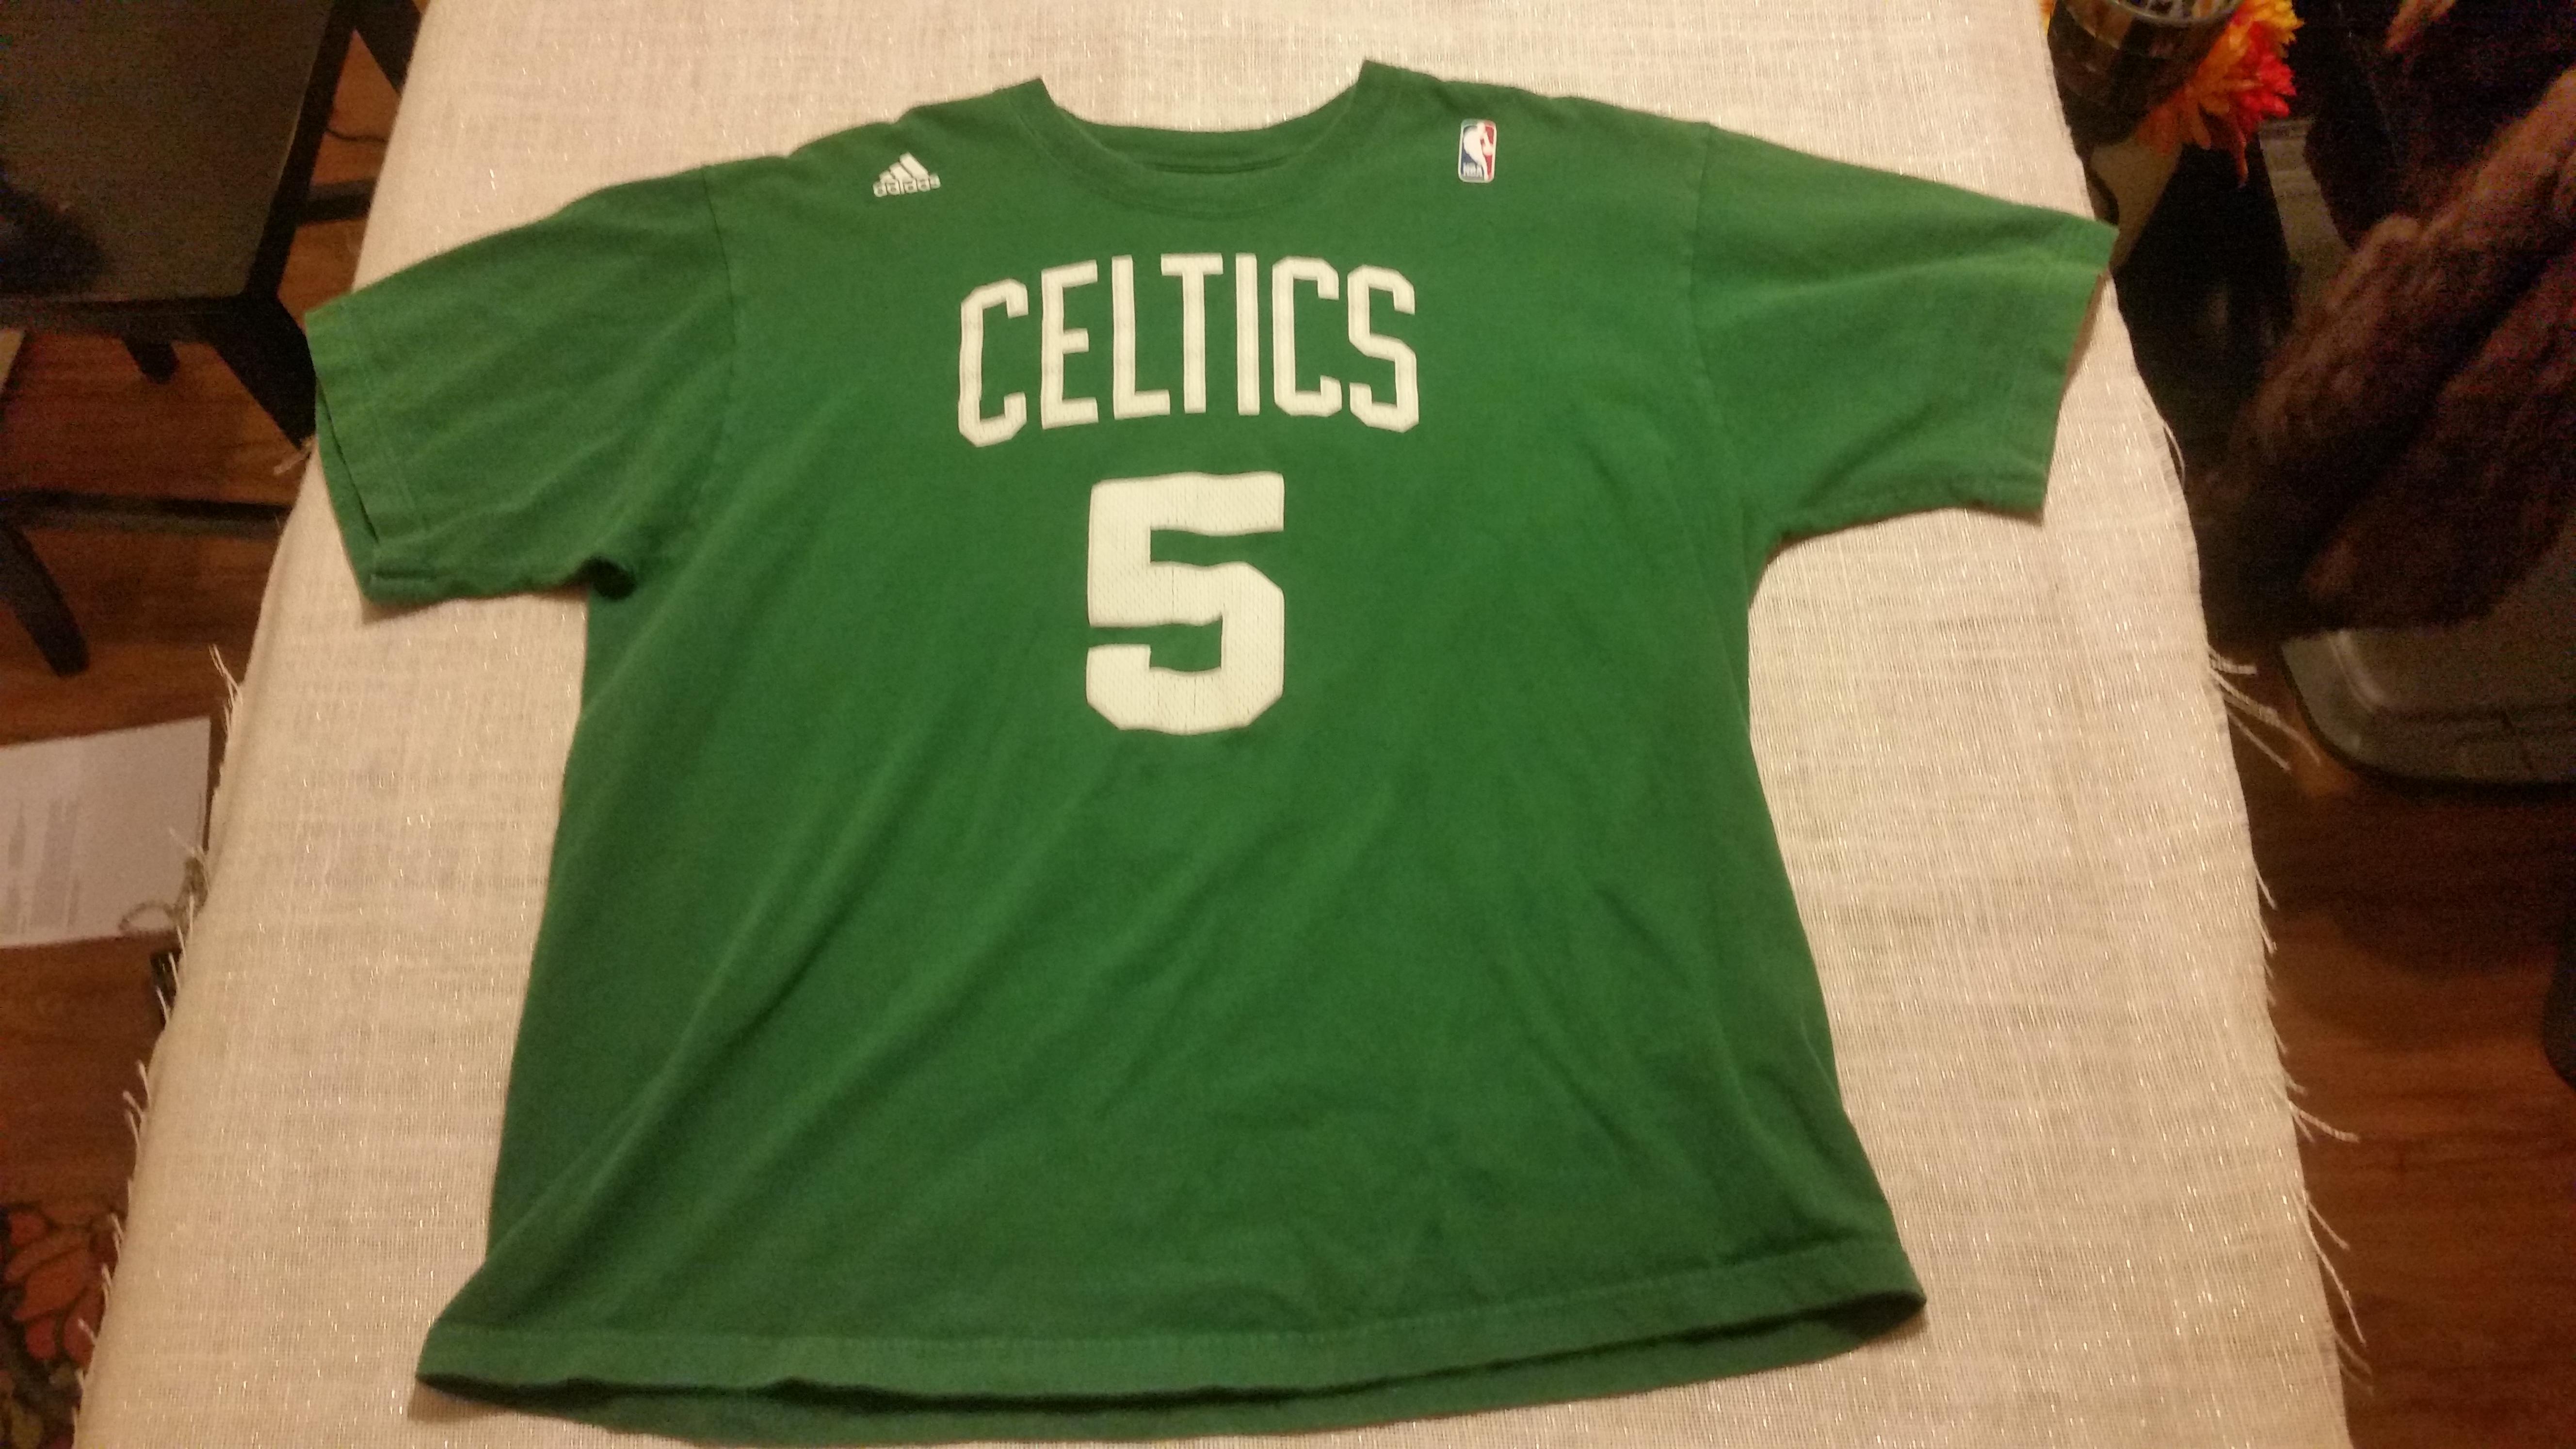 Nba XL NBA Men s Boston Celtics Kevin Garnett Green Adidas  5 Shirt Size xl  - Short Sleeve T-Shirts for Sale - Grailed c69f54ad7